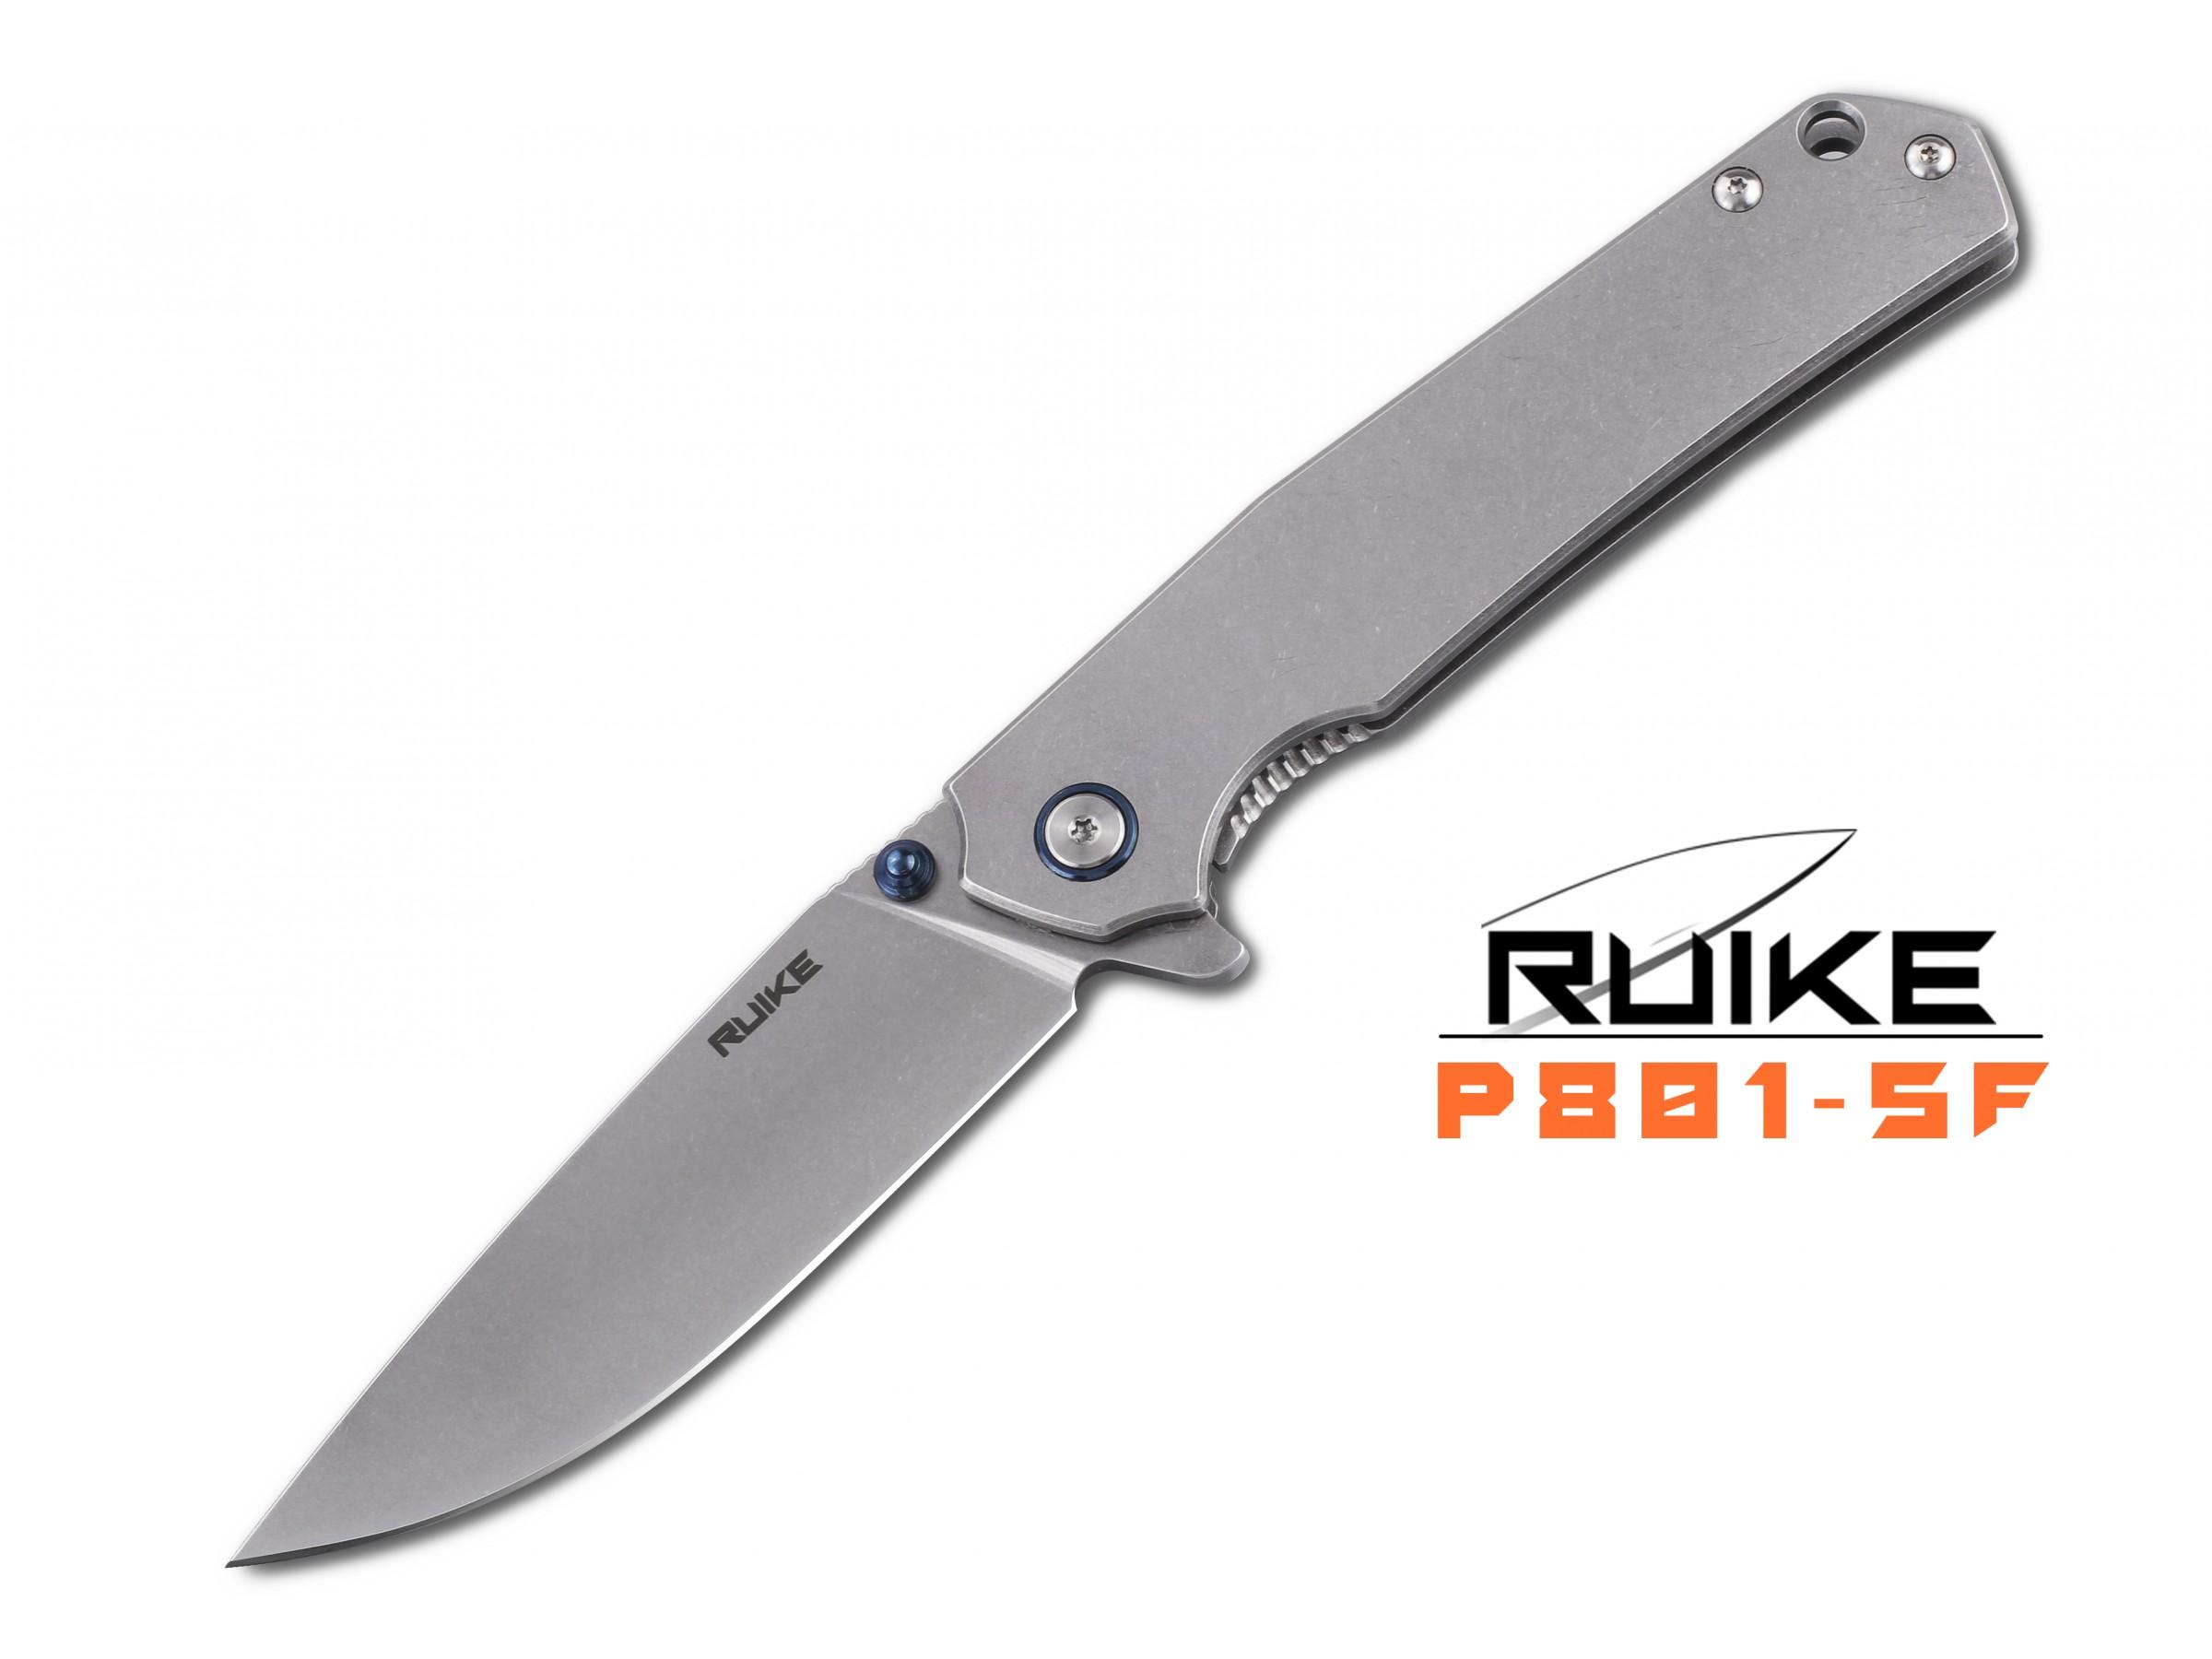 Ruike - P801 - Briceag - Oțel 14C28N - Silver Finish